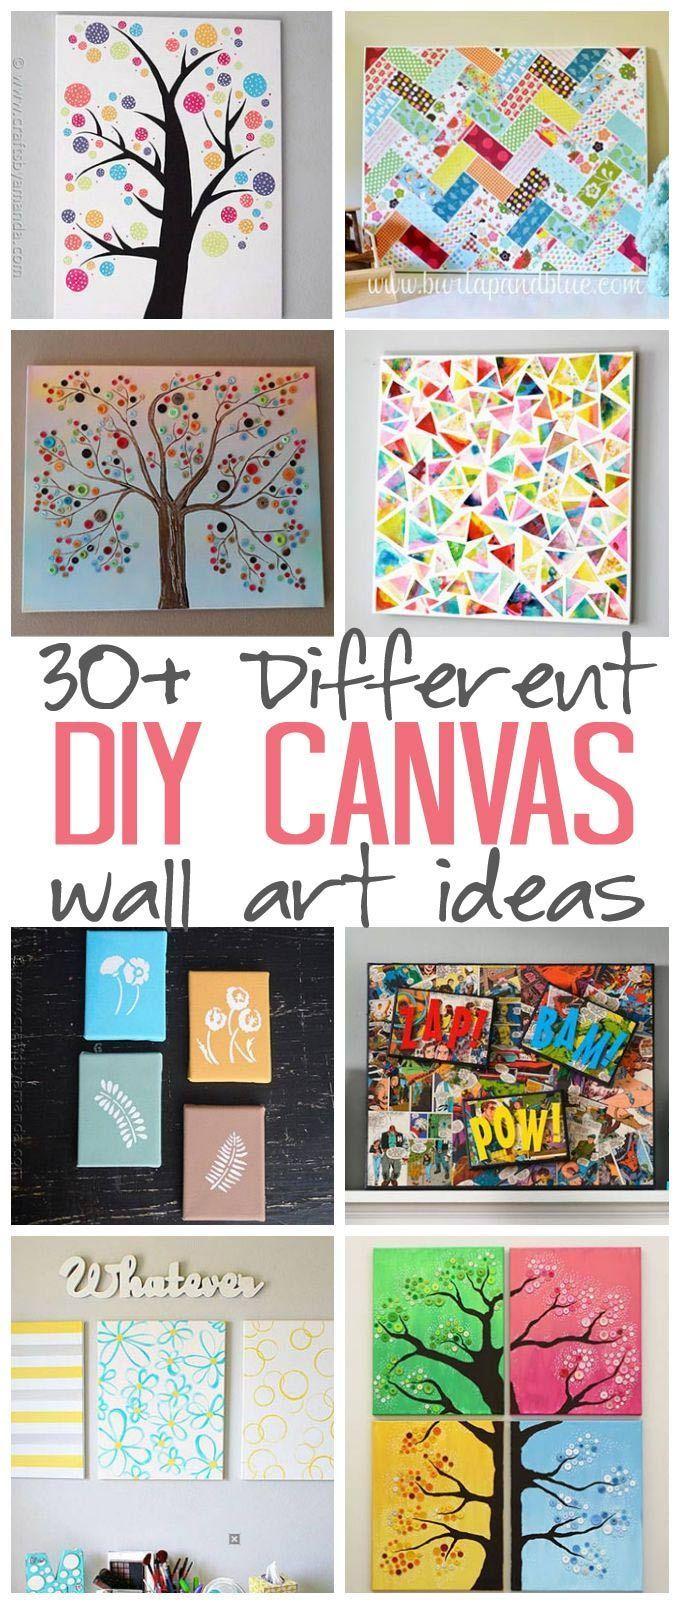 Diy Canvas Wall Art Ideas 30 Canvas Tutorials For Adults